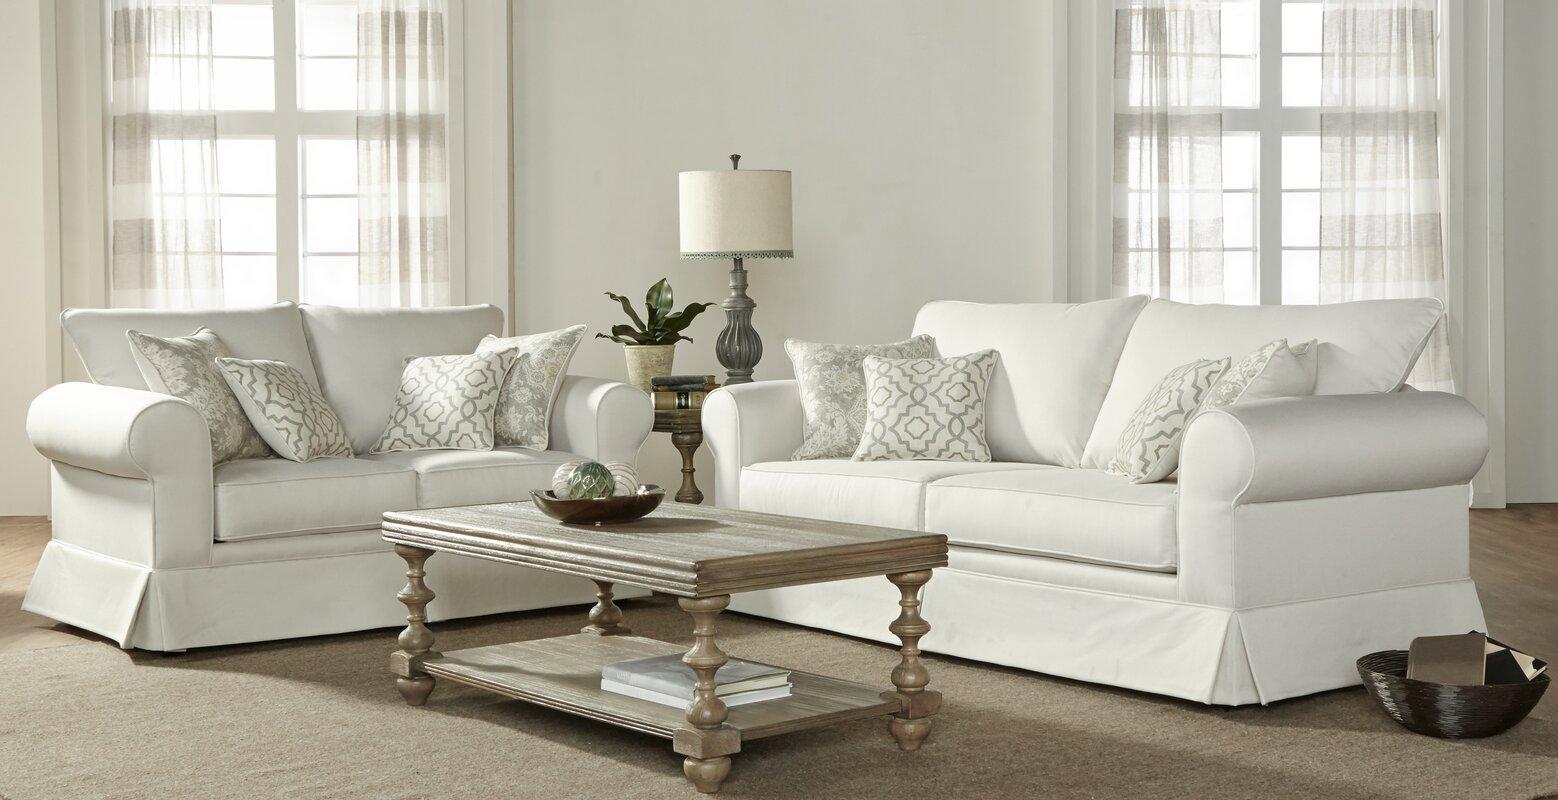 Charlton Home Alverta Configurable Living Room Set & Reviews | Wayfair